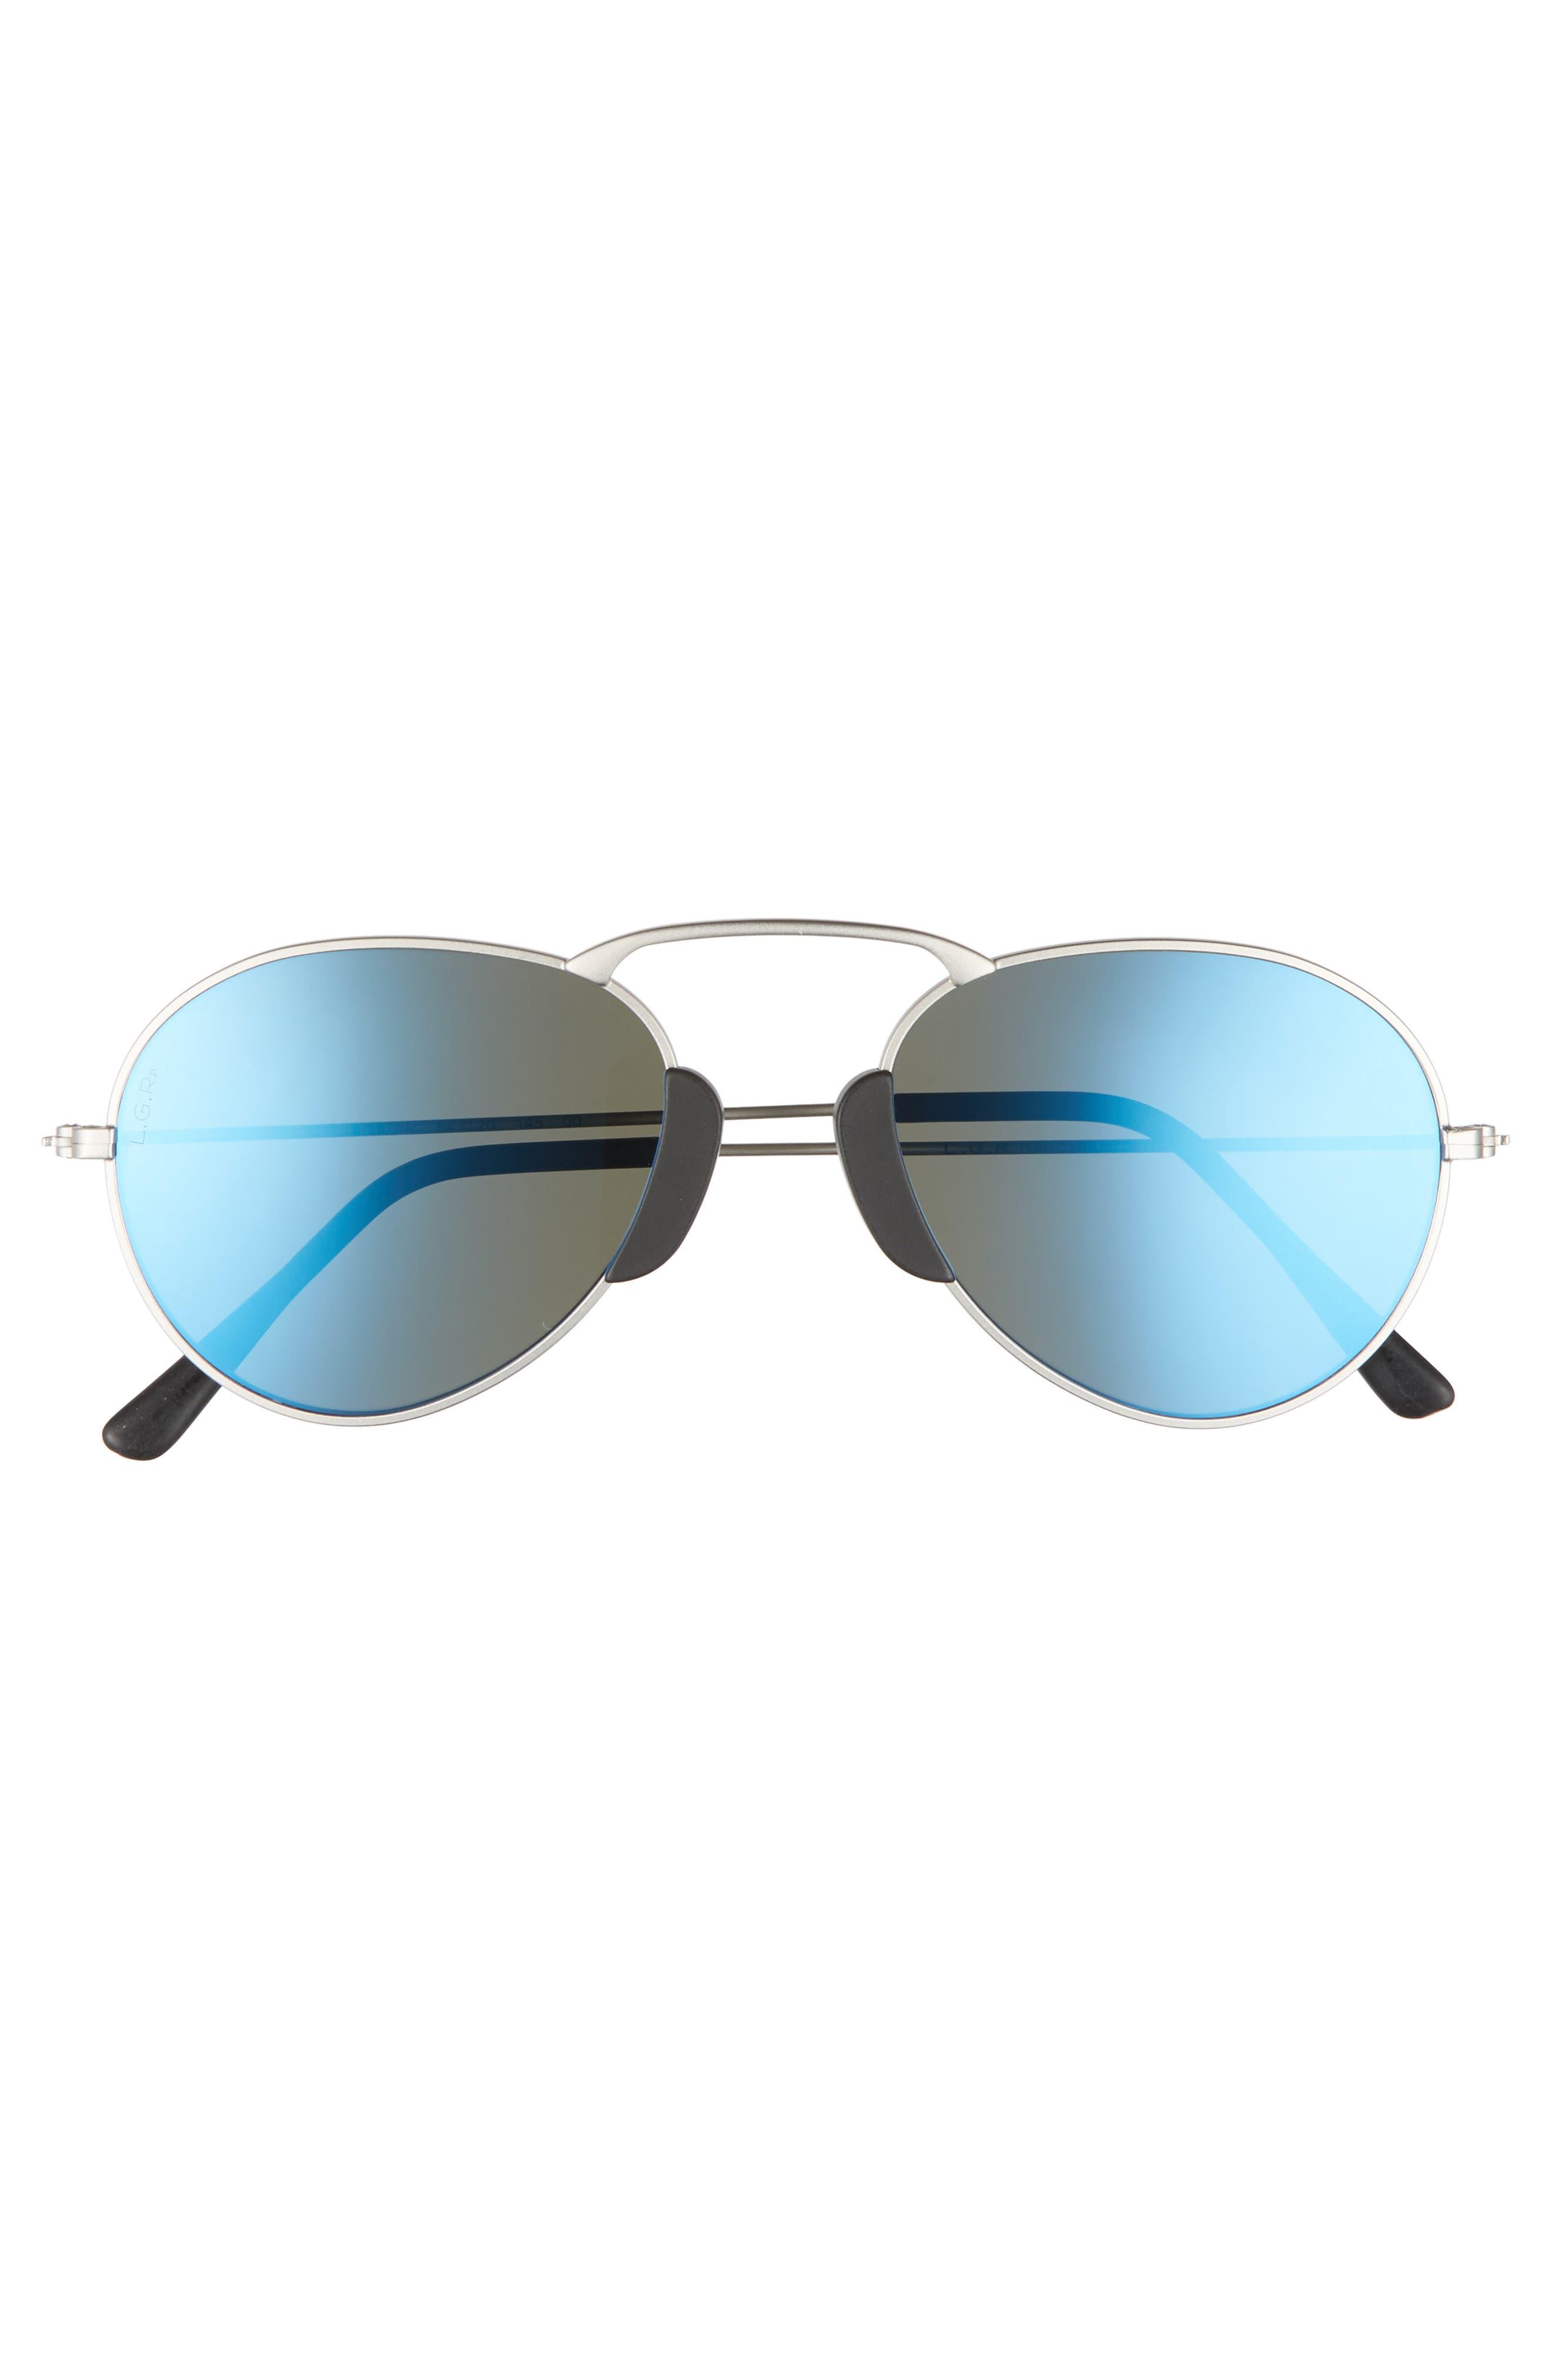 Agadir 54mm Polarized Sunglasses,                             Alternate thumbnail 2, color,                             040